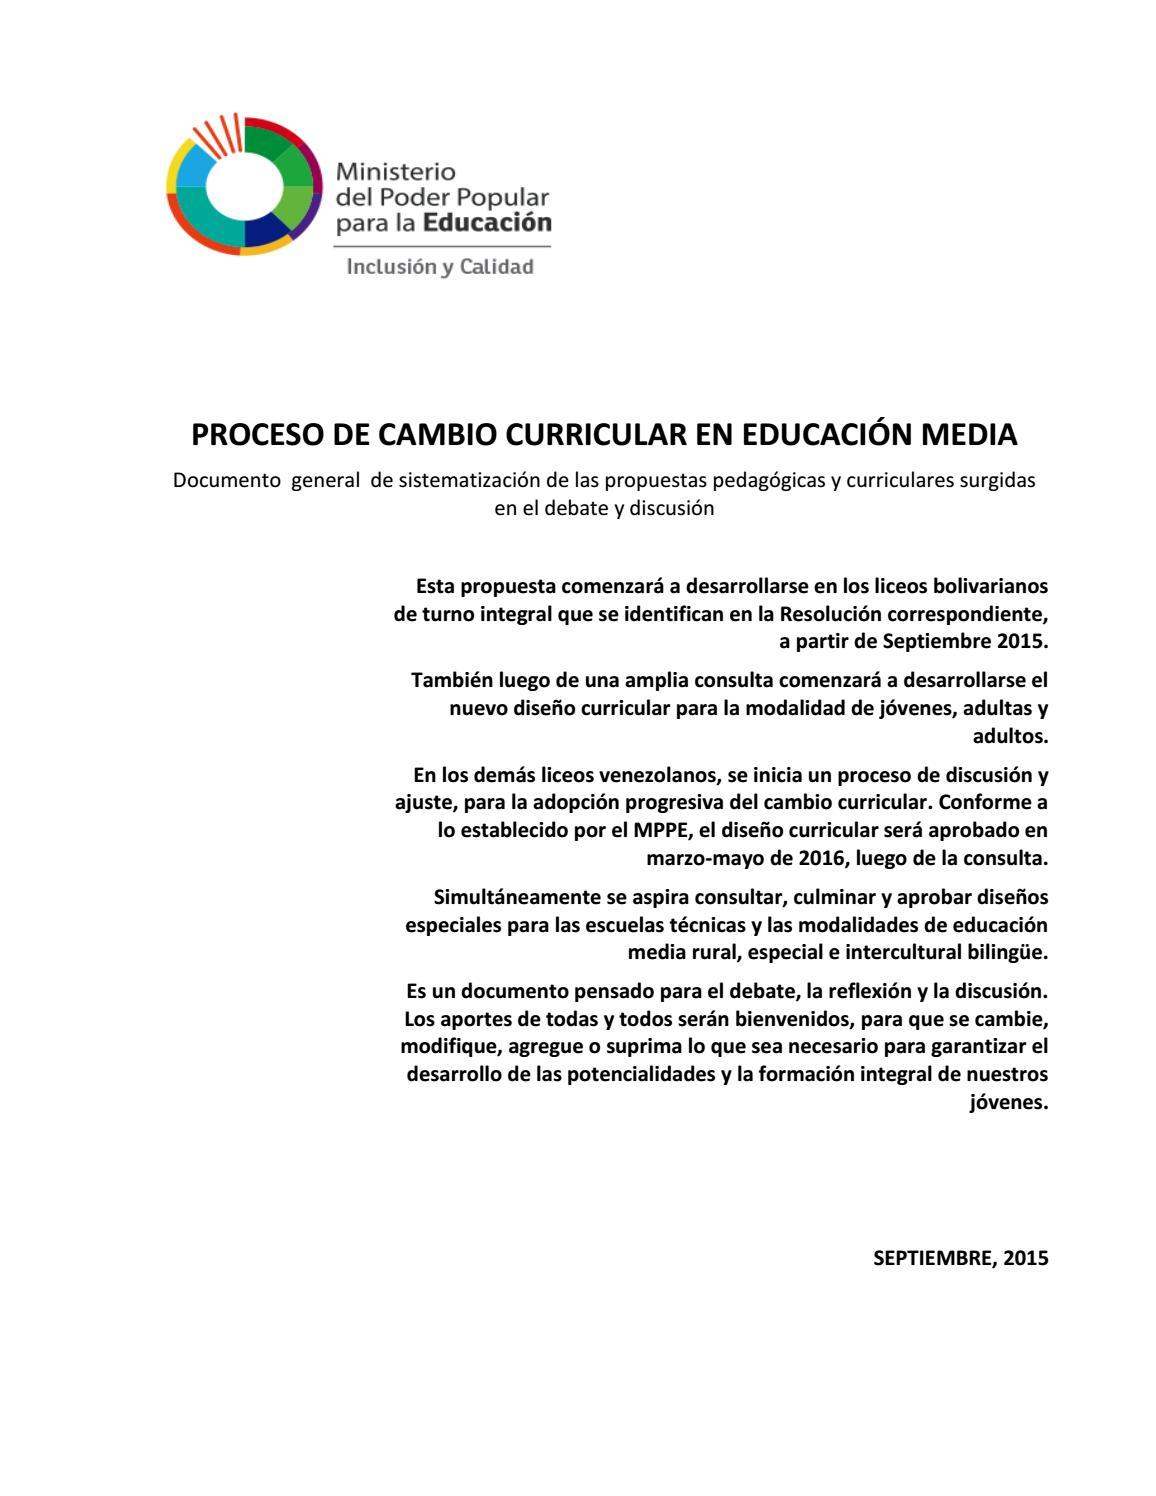 Cambio Curricular Contenido 2016-2017 by Teorias_Aprendizaje_XXI - issuu